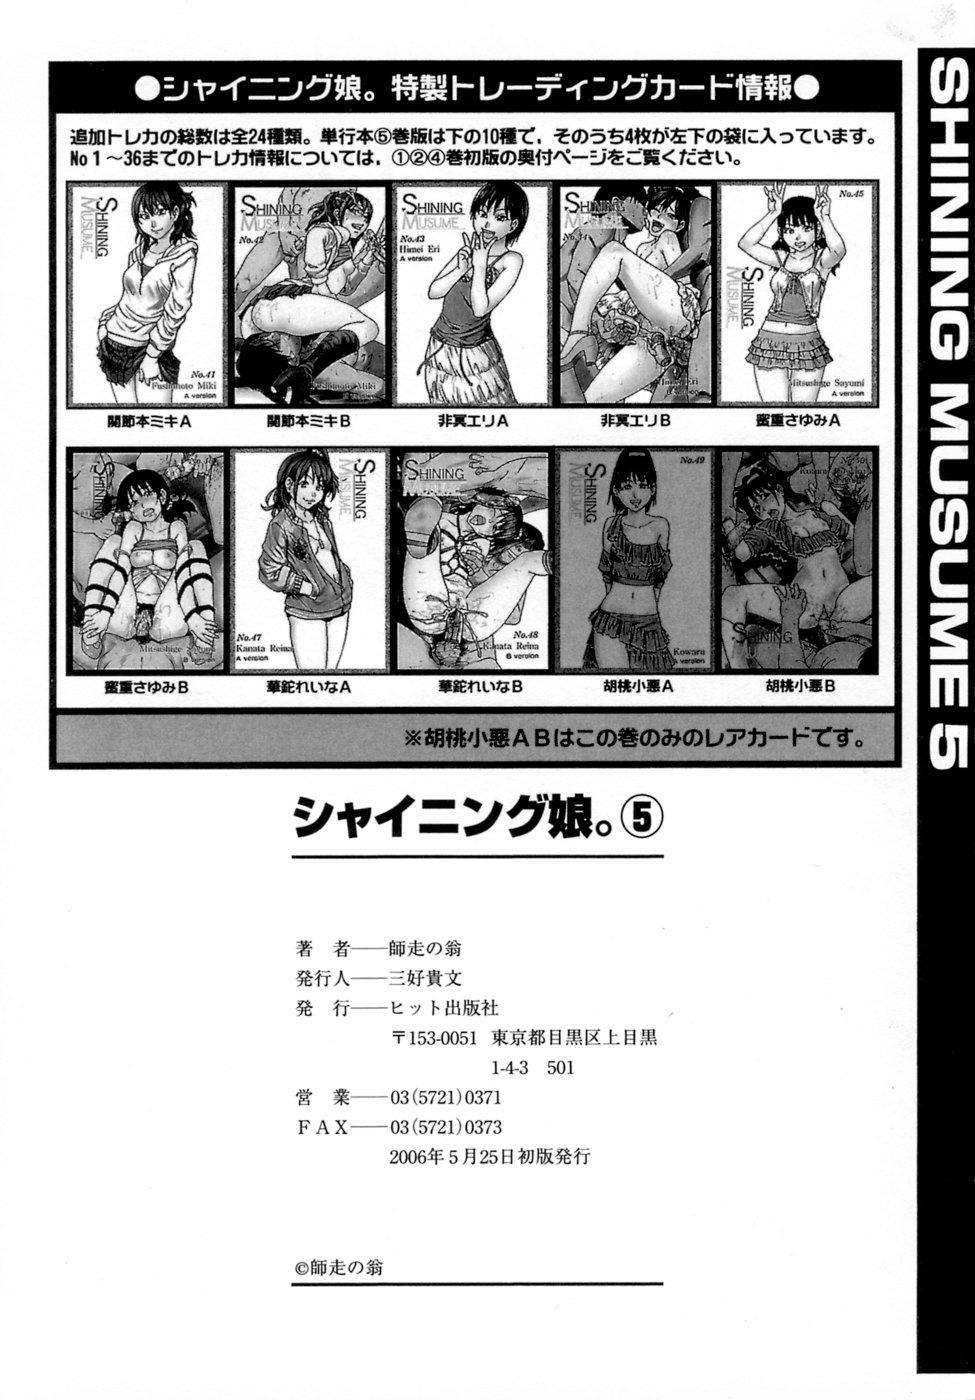 Shining Musume. 5. Five Sense of Love 210